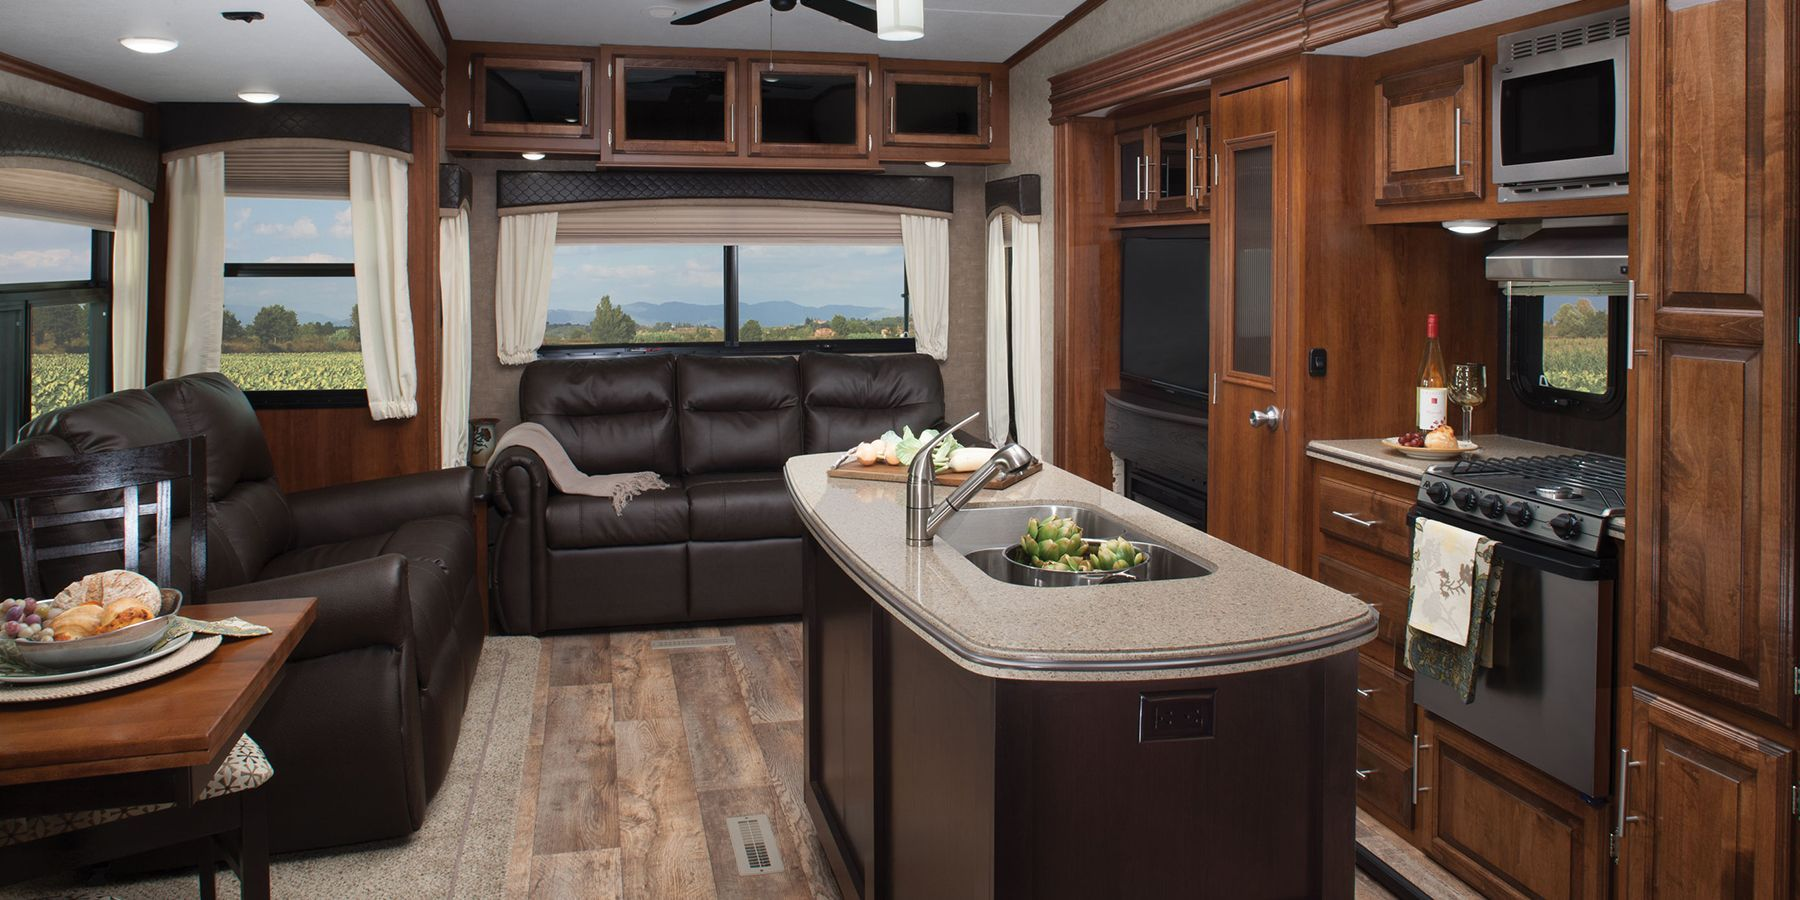 2016 Eagle Fifth Wheel Camper Jayco, Inc. Fifth wheel